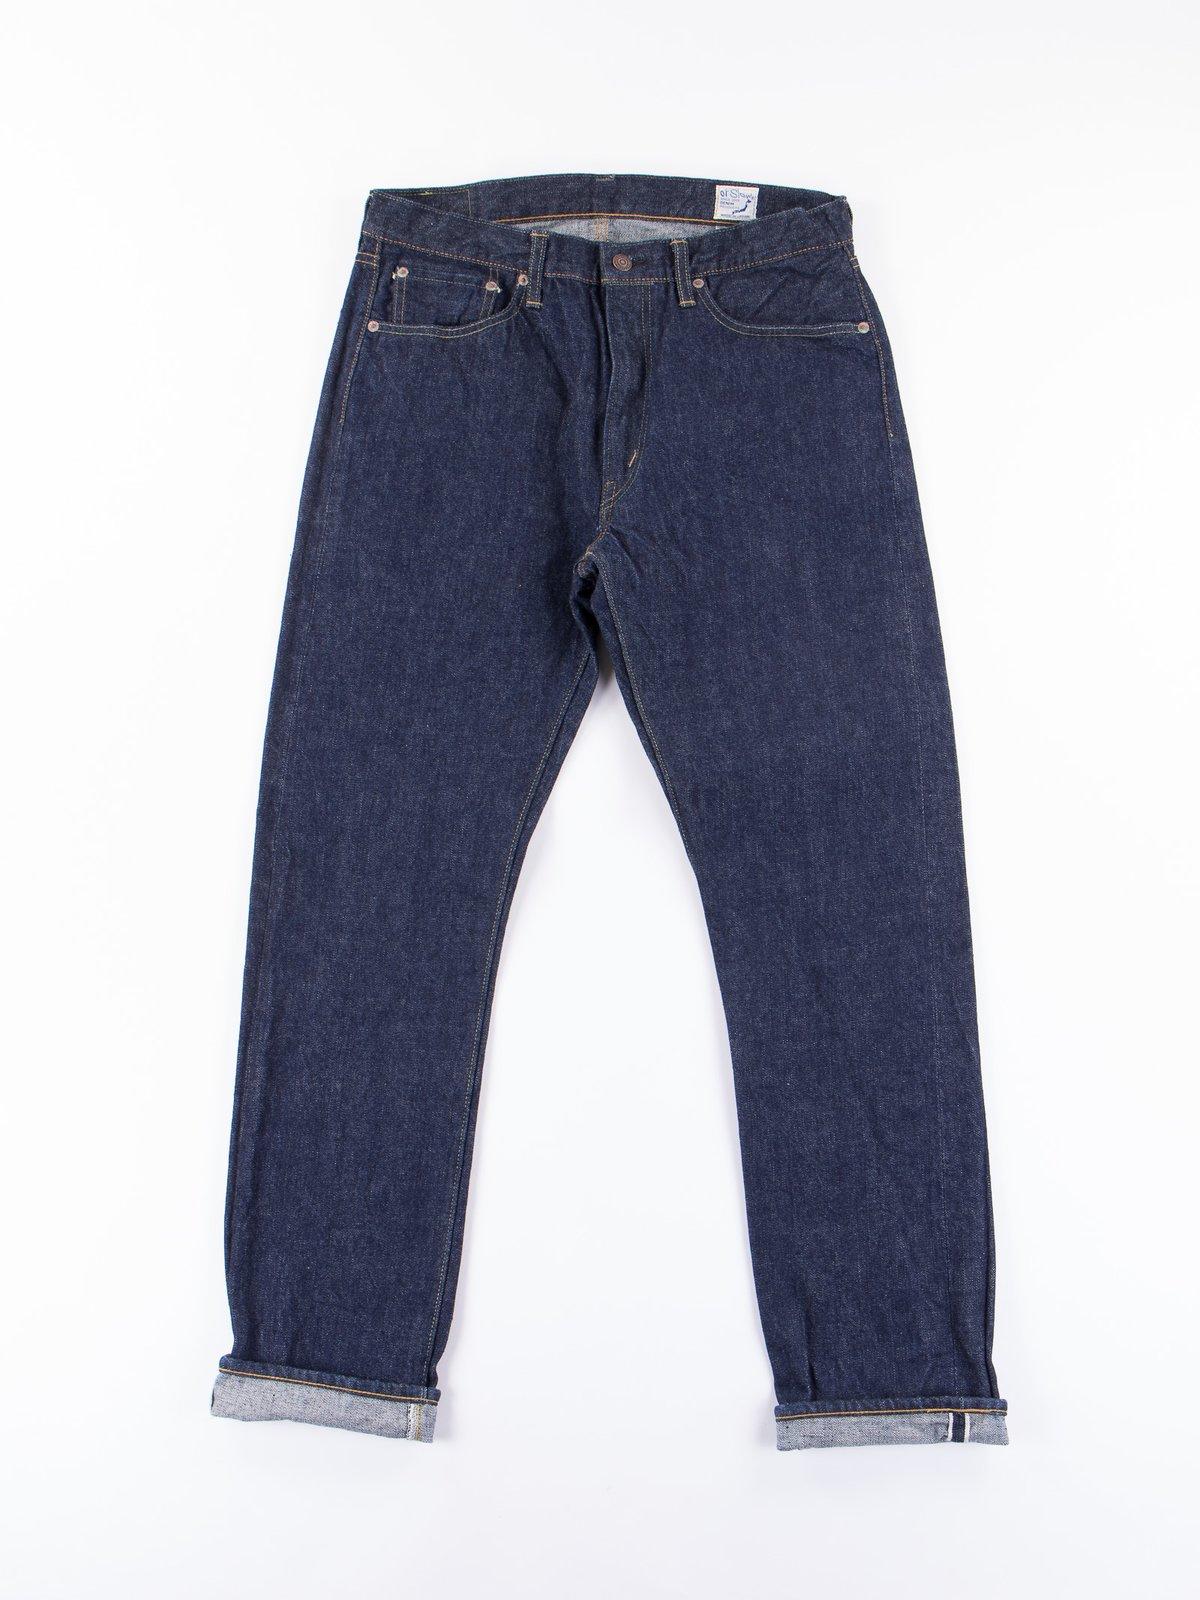 One Wash 107 Slim Fit Jean - Image 1